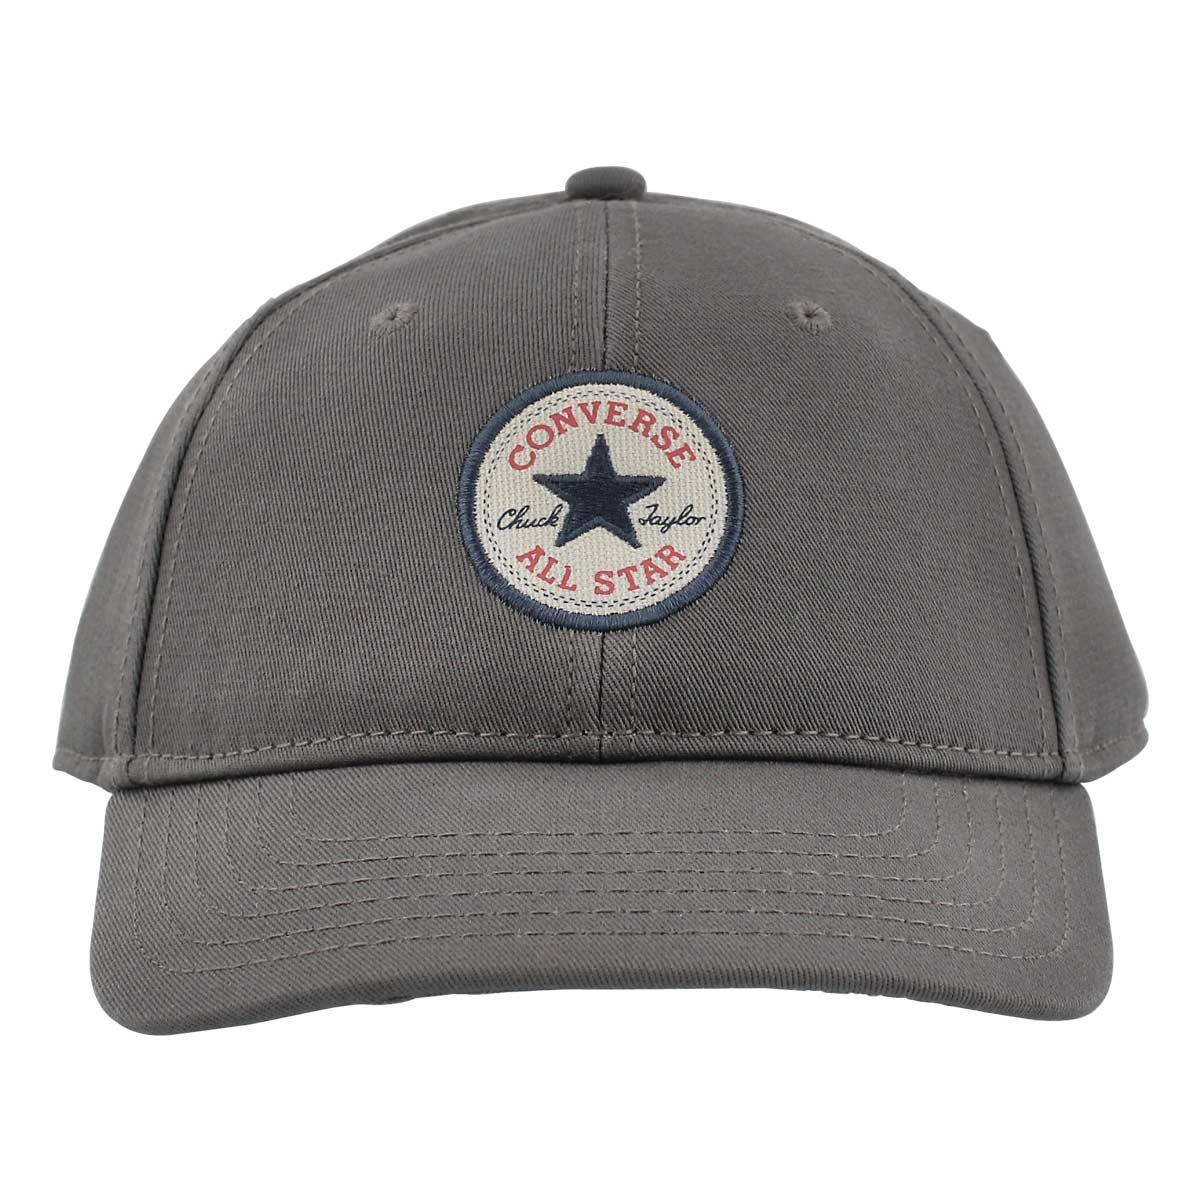 Women's CORE charcoal adjustable precurve cap